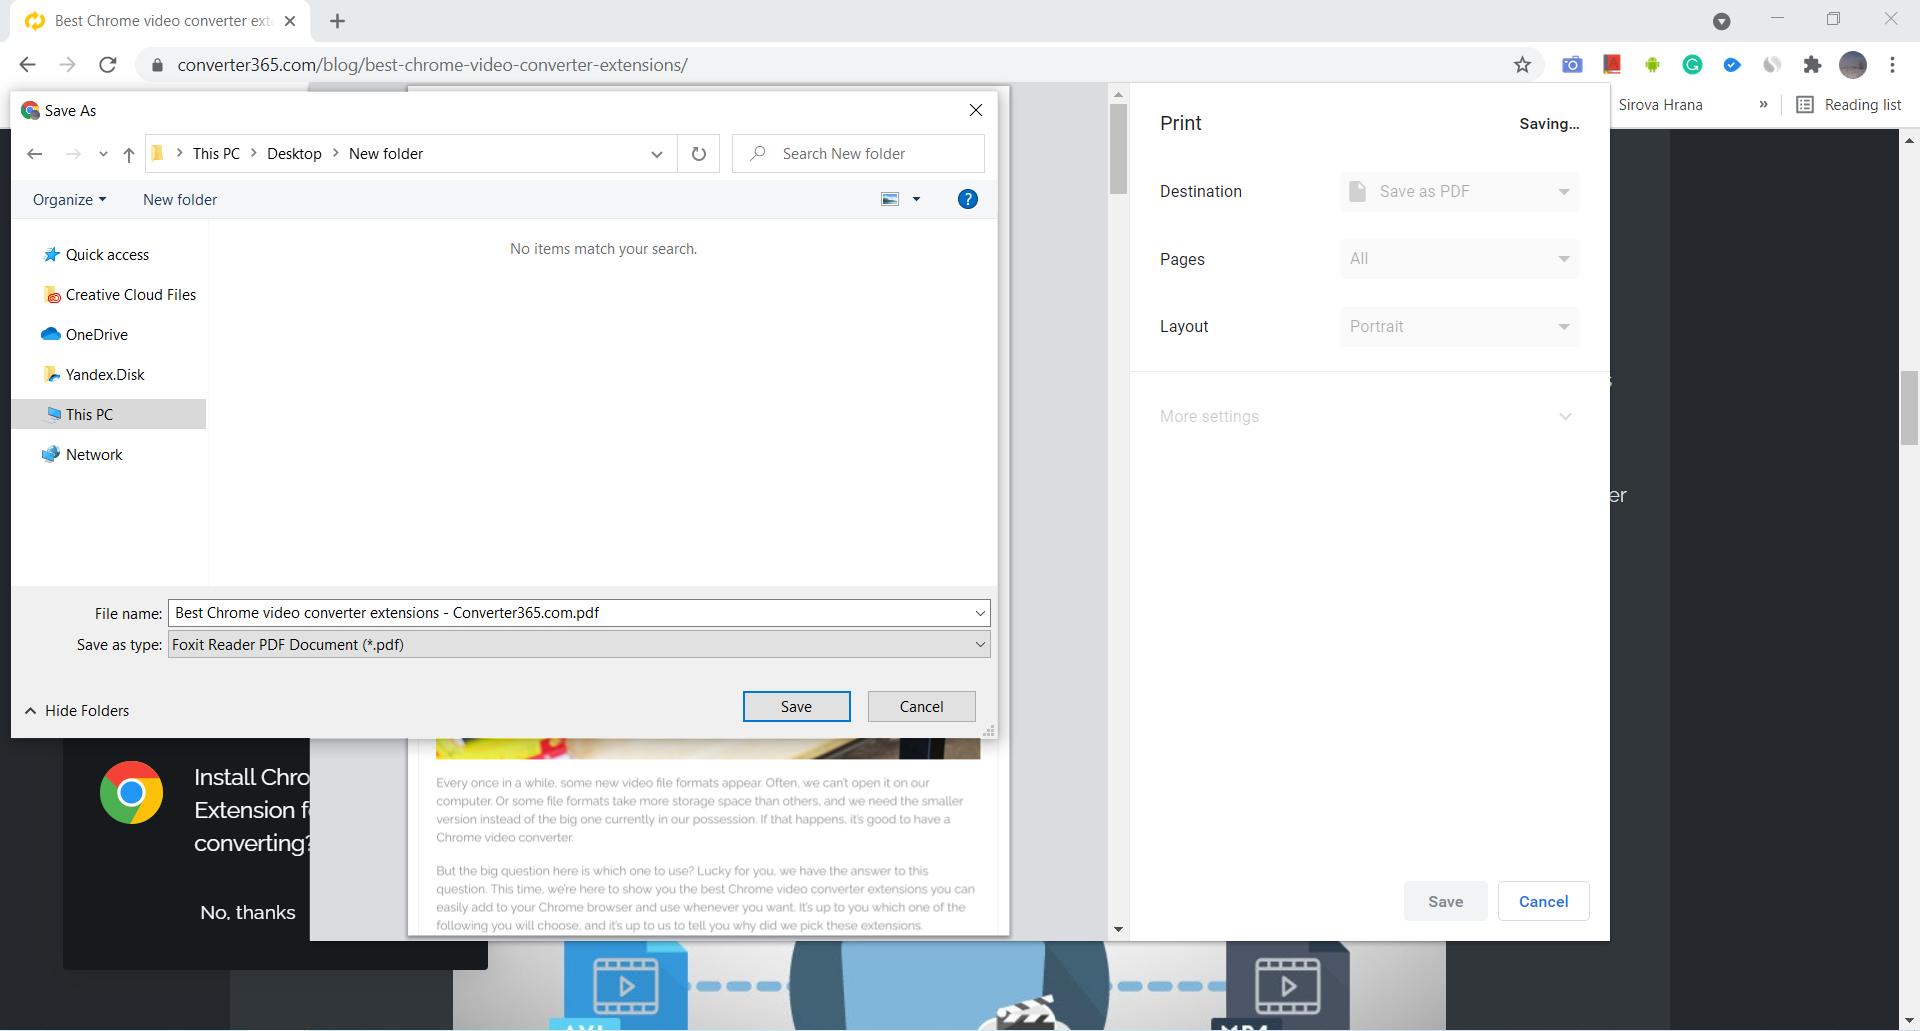 How to save a webpage as a PDF using Google Chrome?